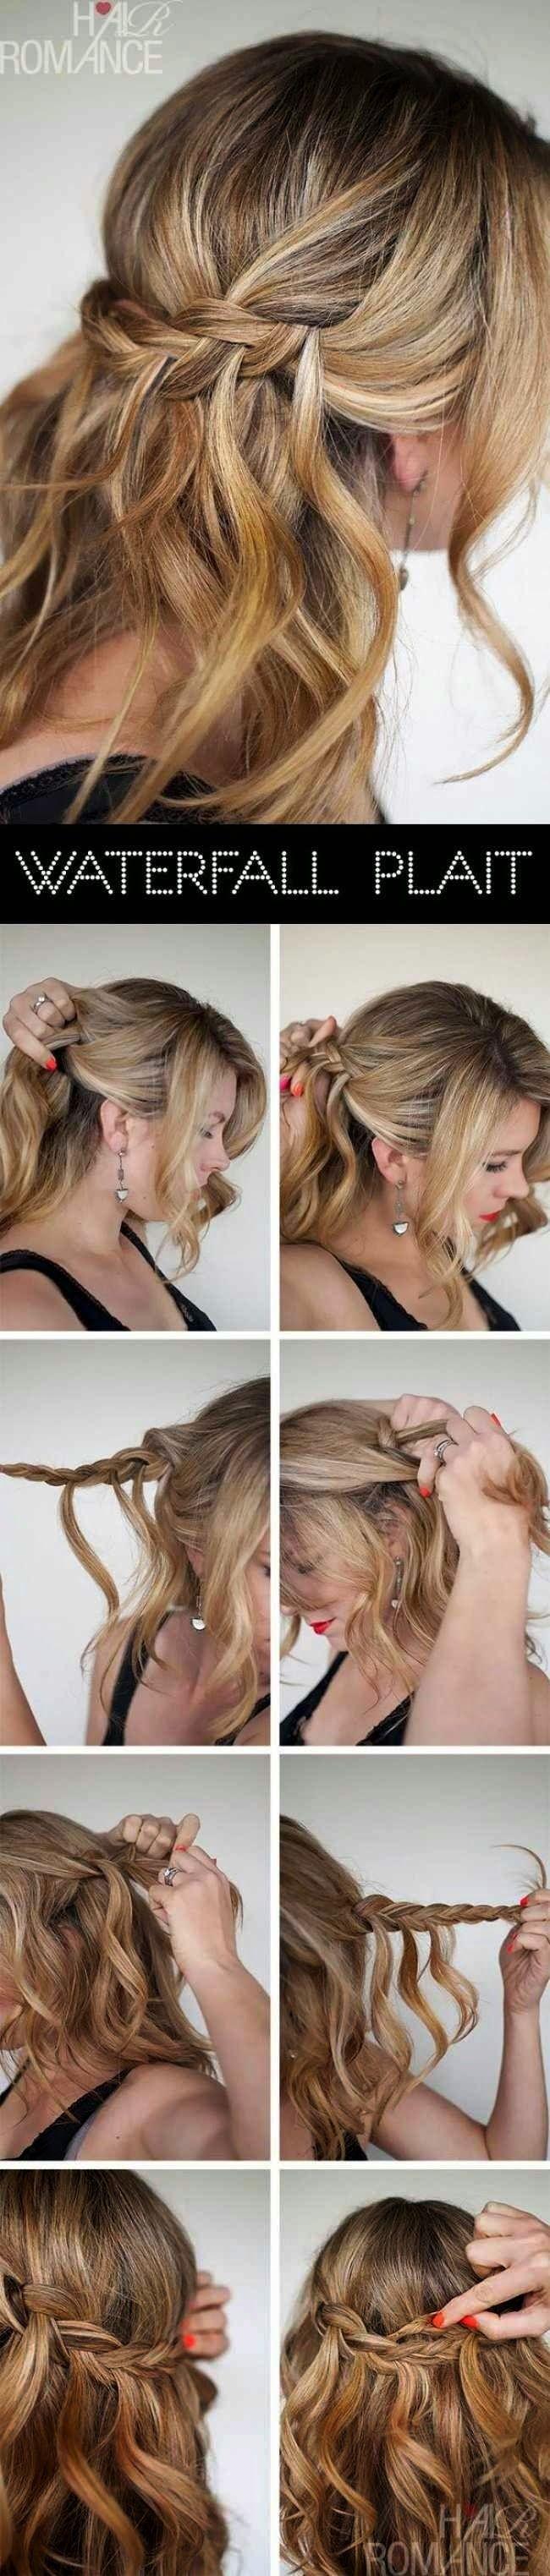 59 best Peinados images on Pinterest